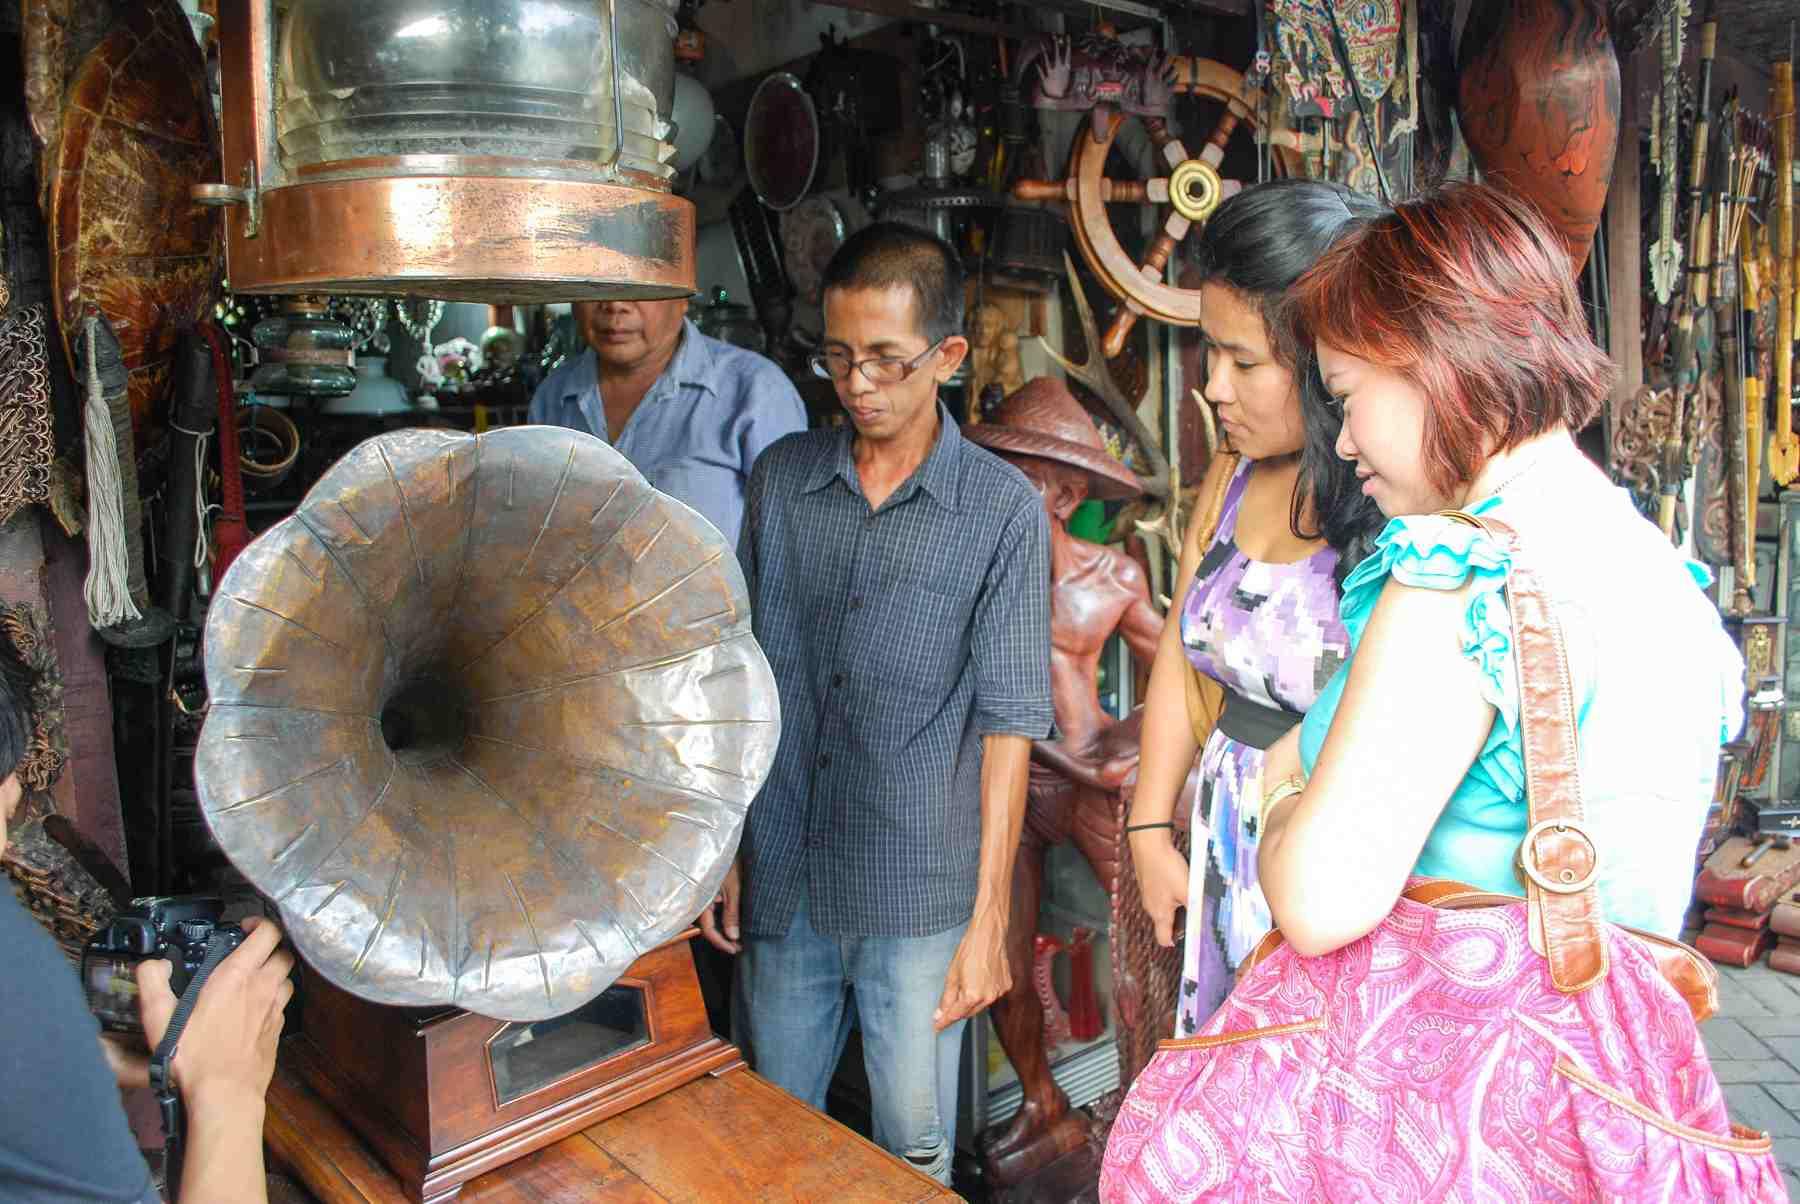 Victrola antigua a la venta en Jalan Surabaya, Yakarta